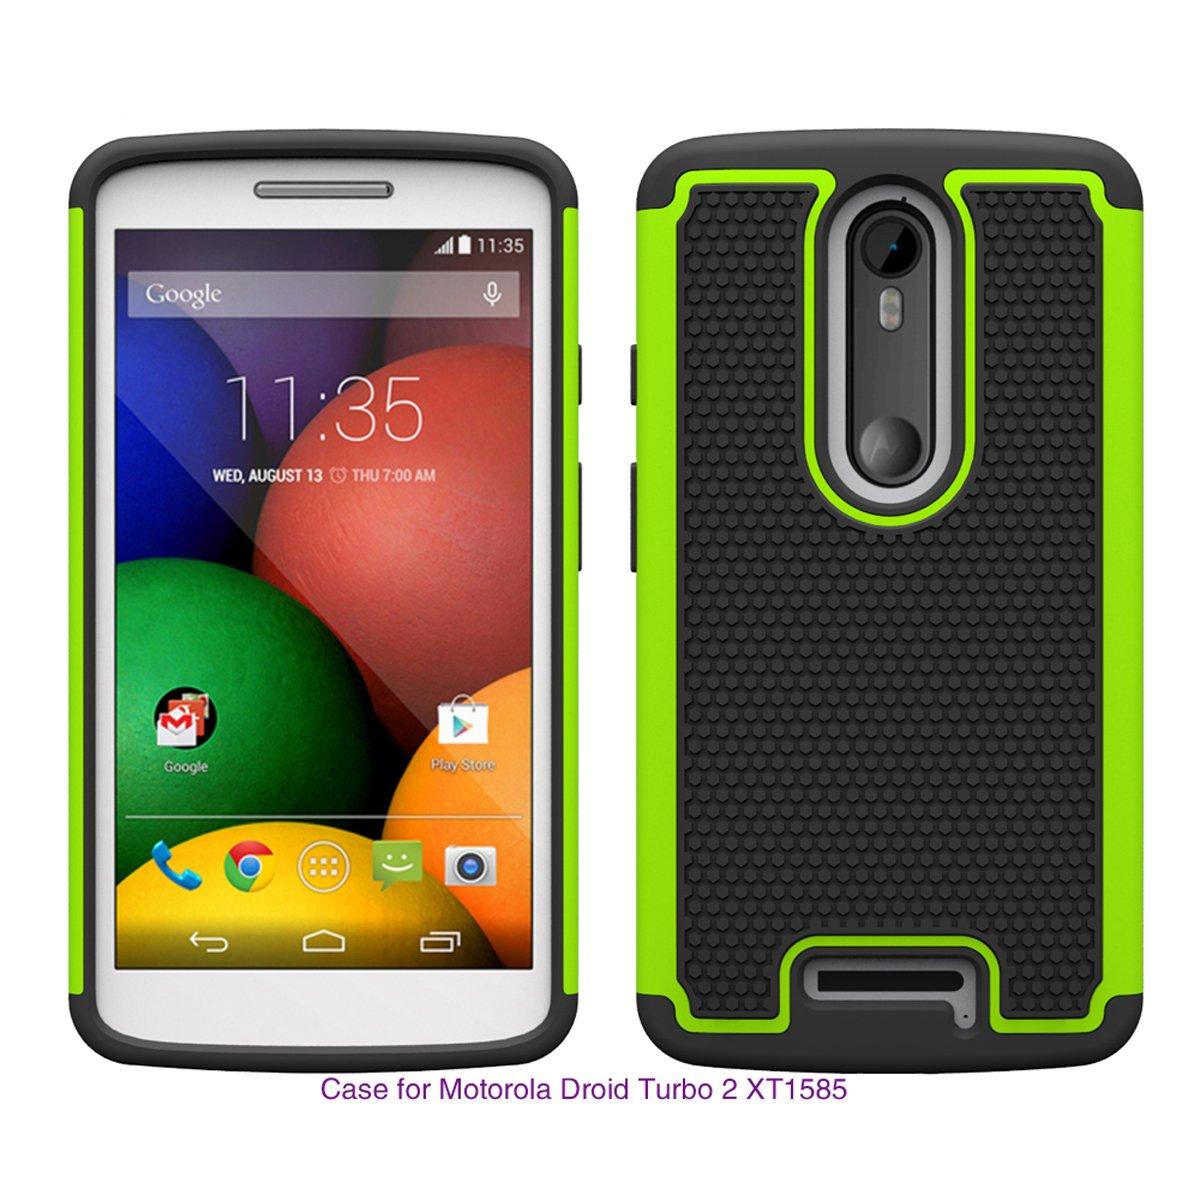 BasicStock Motorola Moto Droid turbo 2 XT1585 Case, Protection Slim Case Premium High Impact Dirtproof Shockproof Protective Defender Cover Case for ...